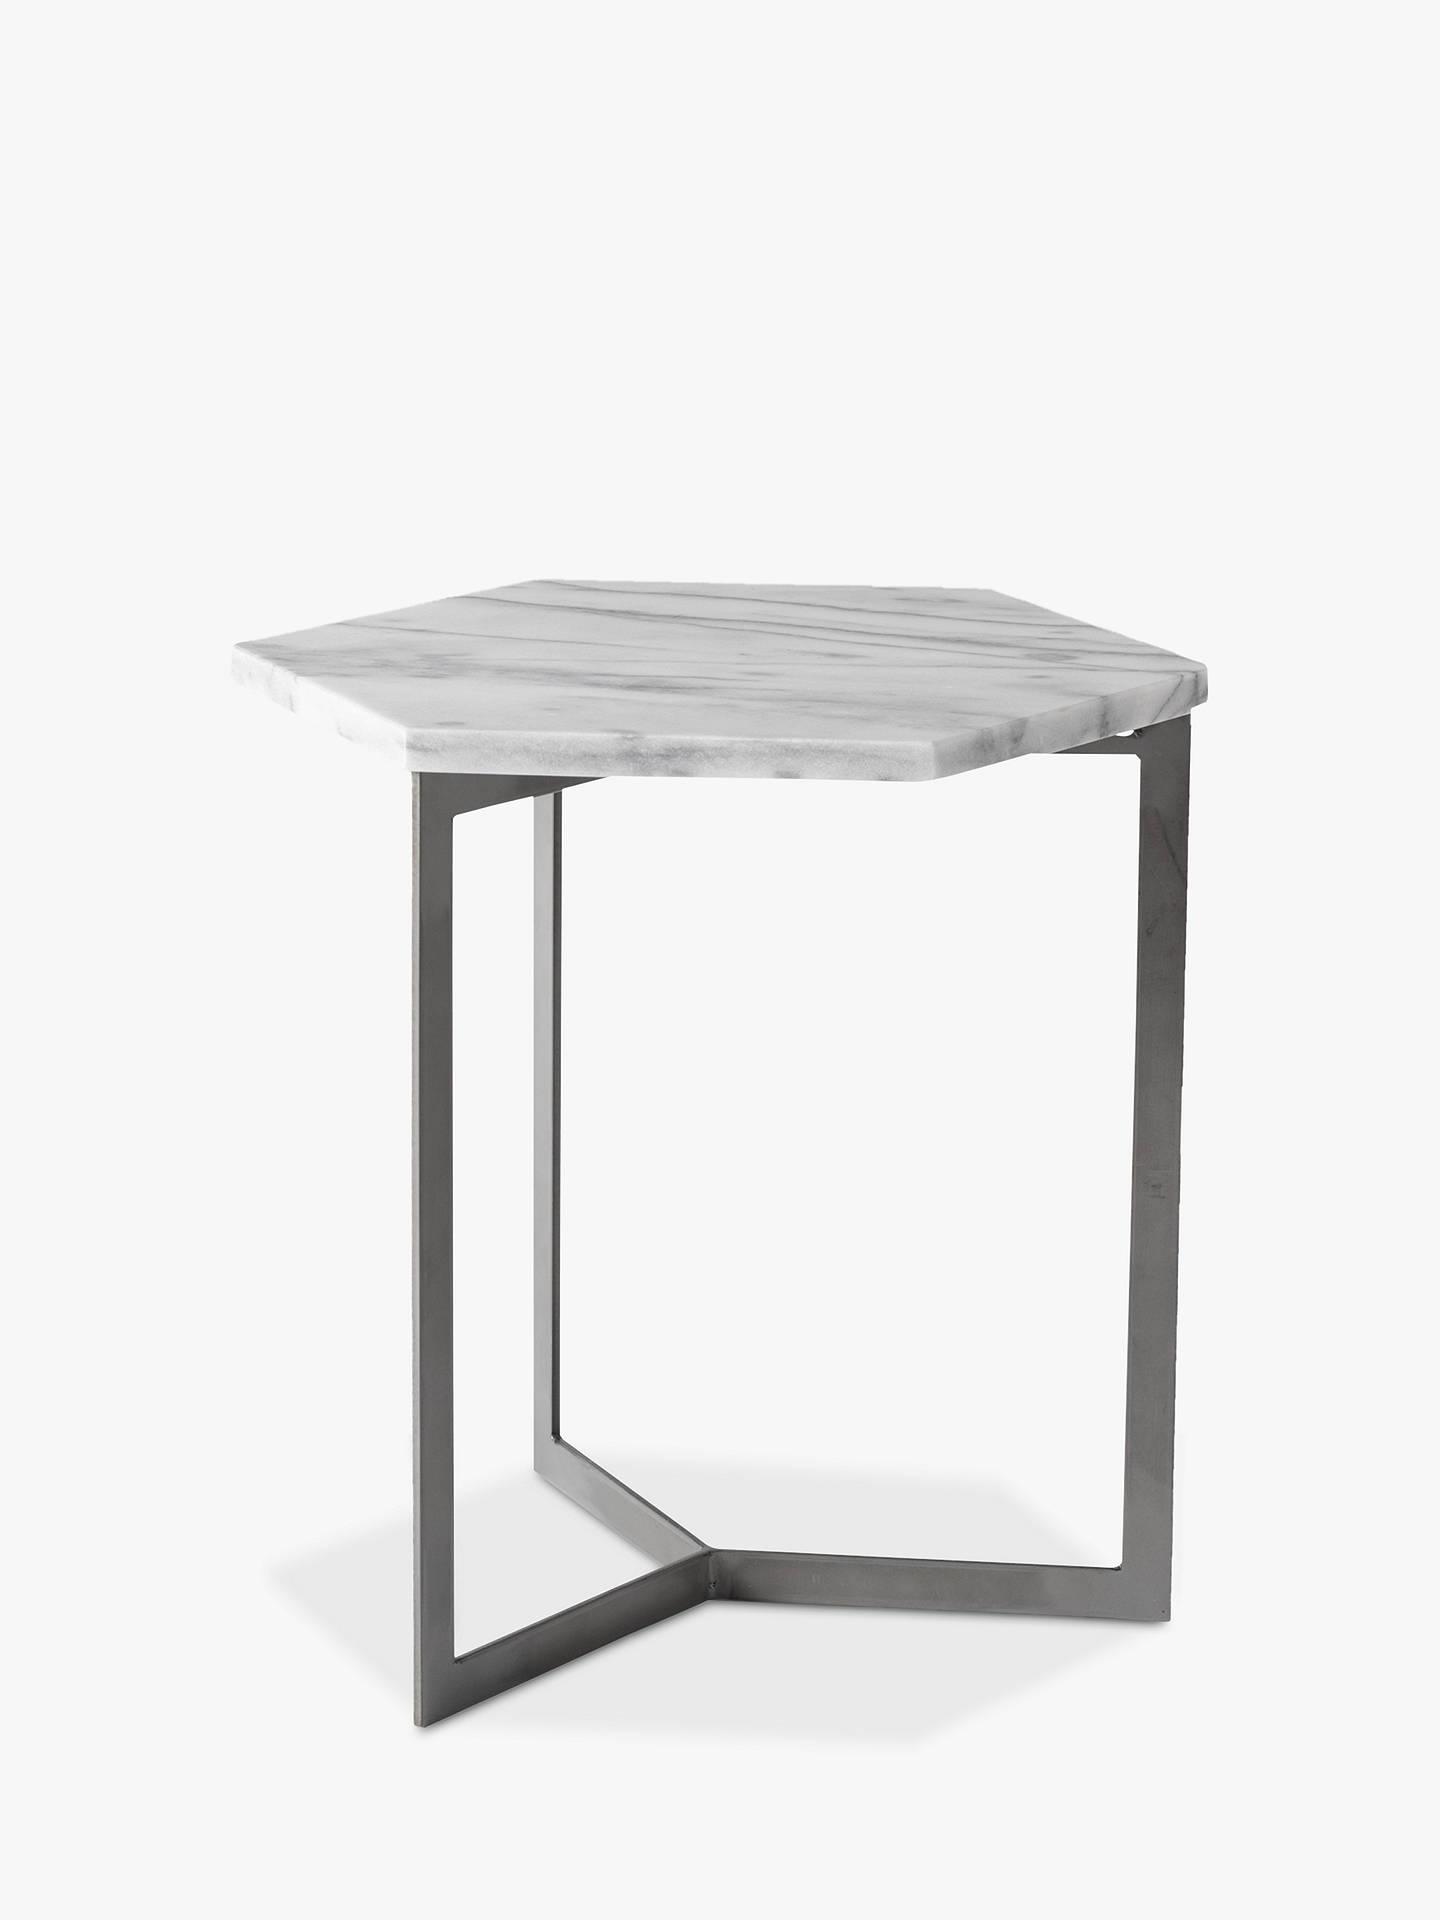 west elm hex side table white marble steel at john lewis partners. Black Bedroom Furniture Sets. Home Design Ideas